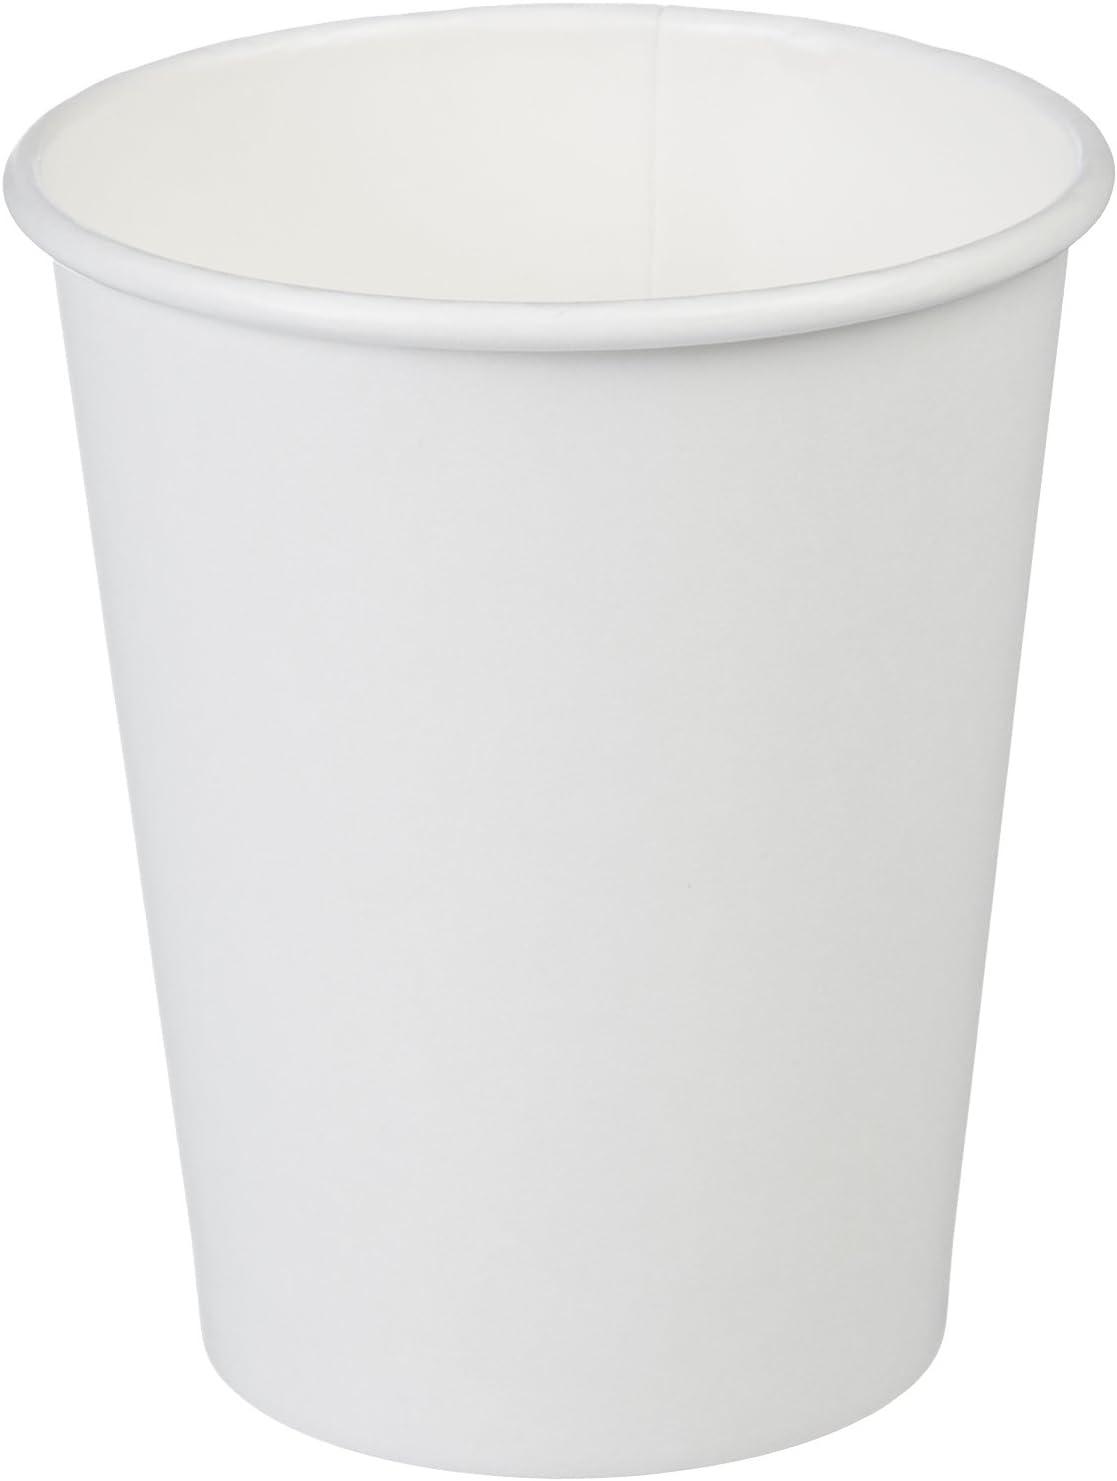 AmazonBasics Paper Hot Cup, 8 oz., 500-Count